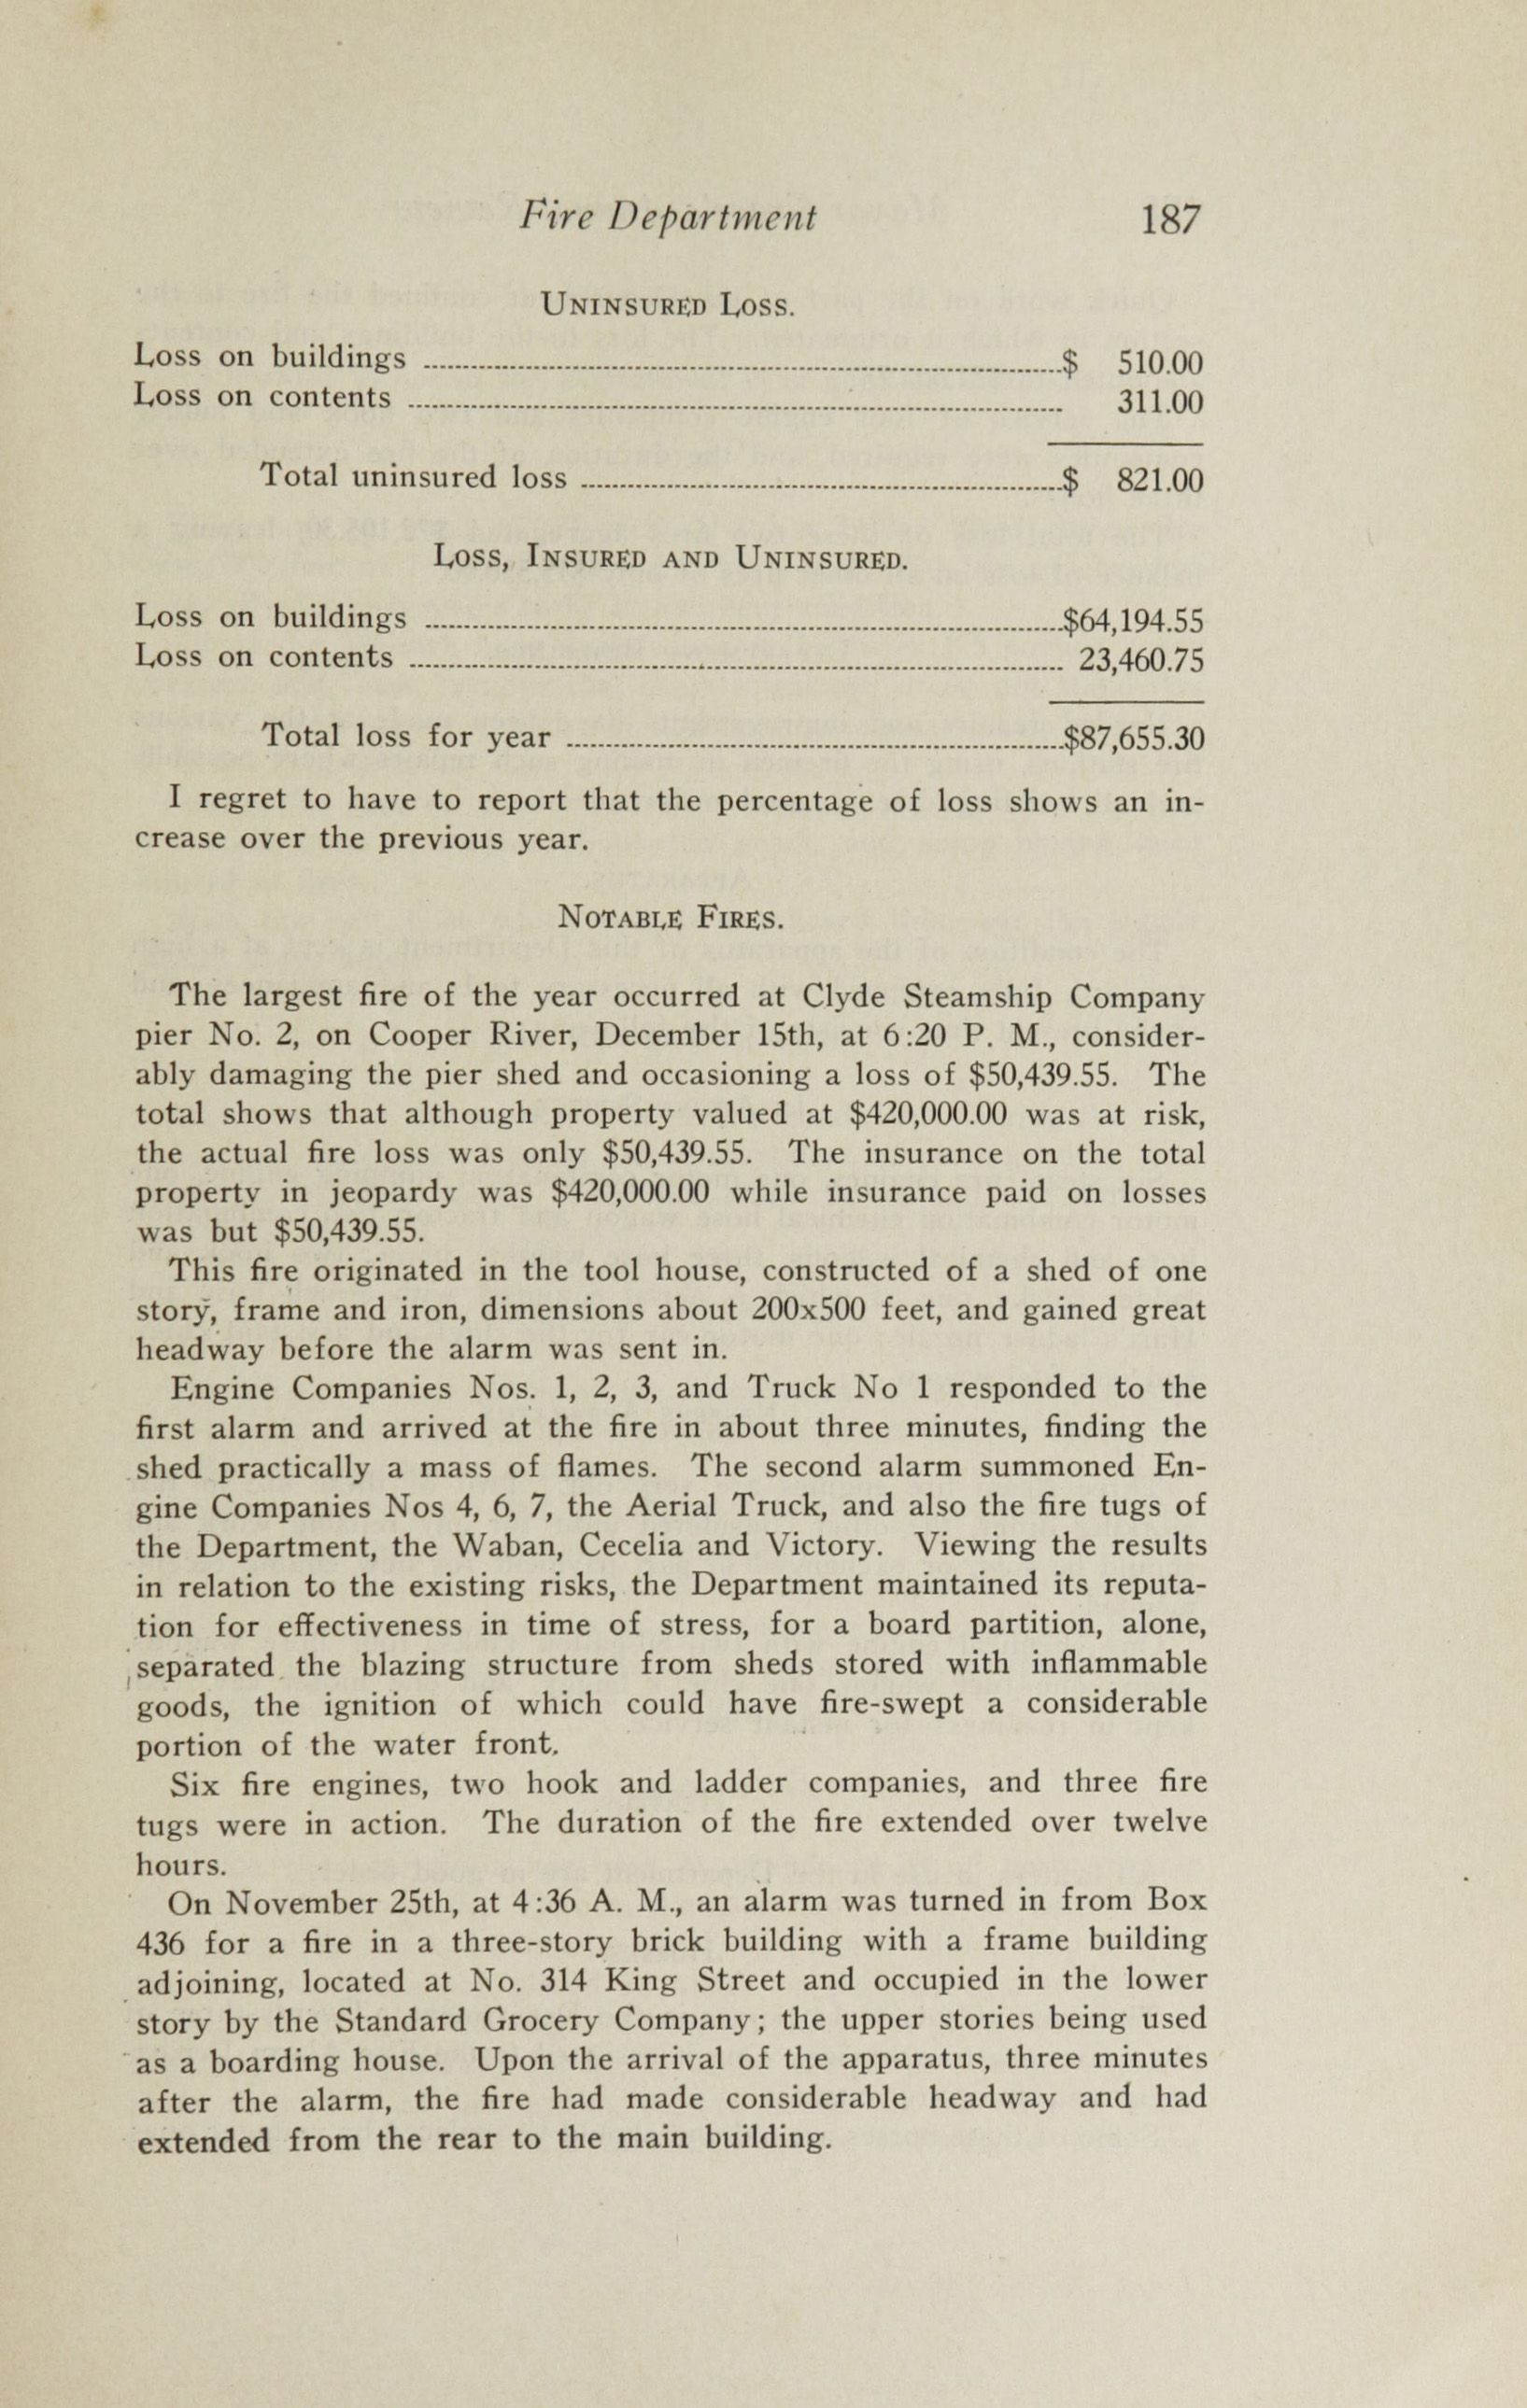 Charleston Yearbook, 1913, page 187